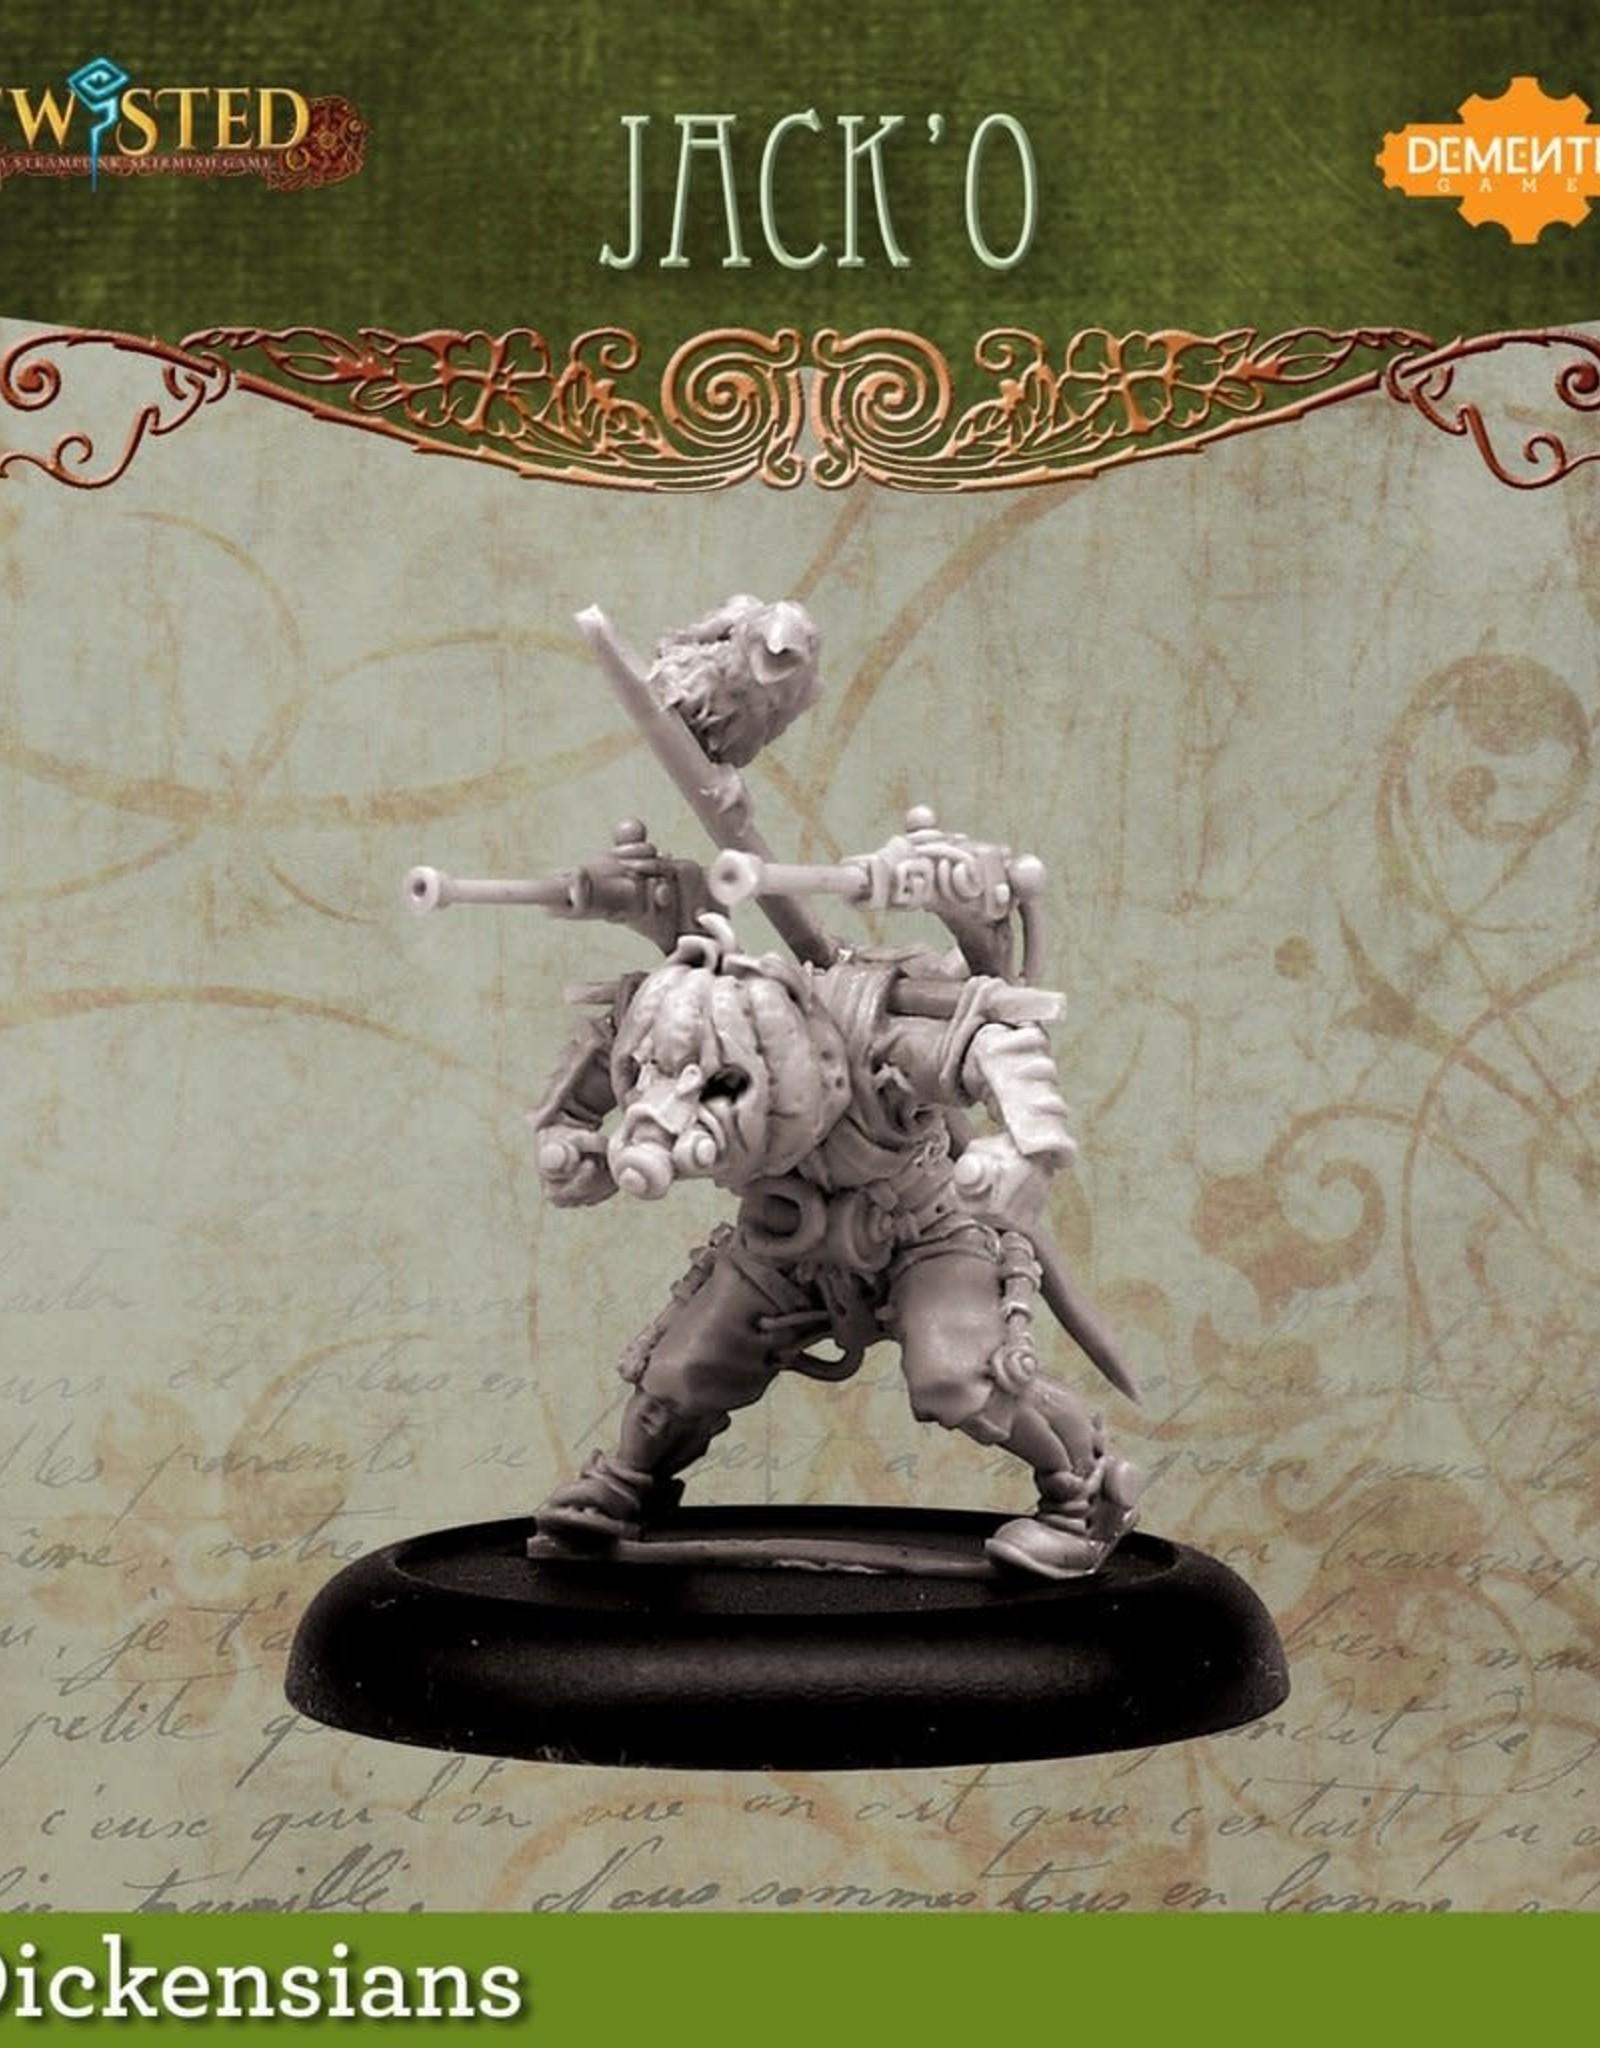 Demented Games Jack'O the Urkin - Metal